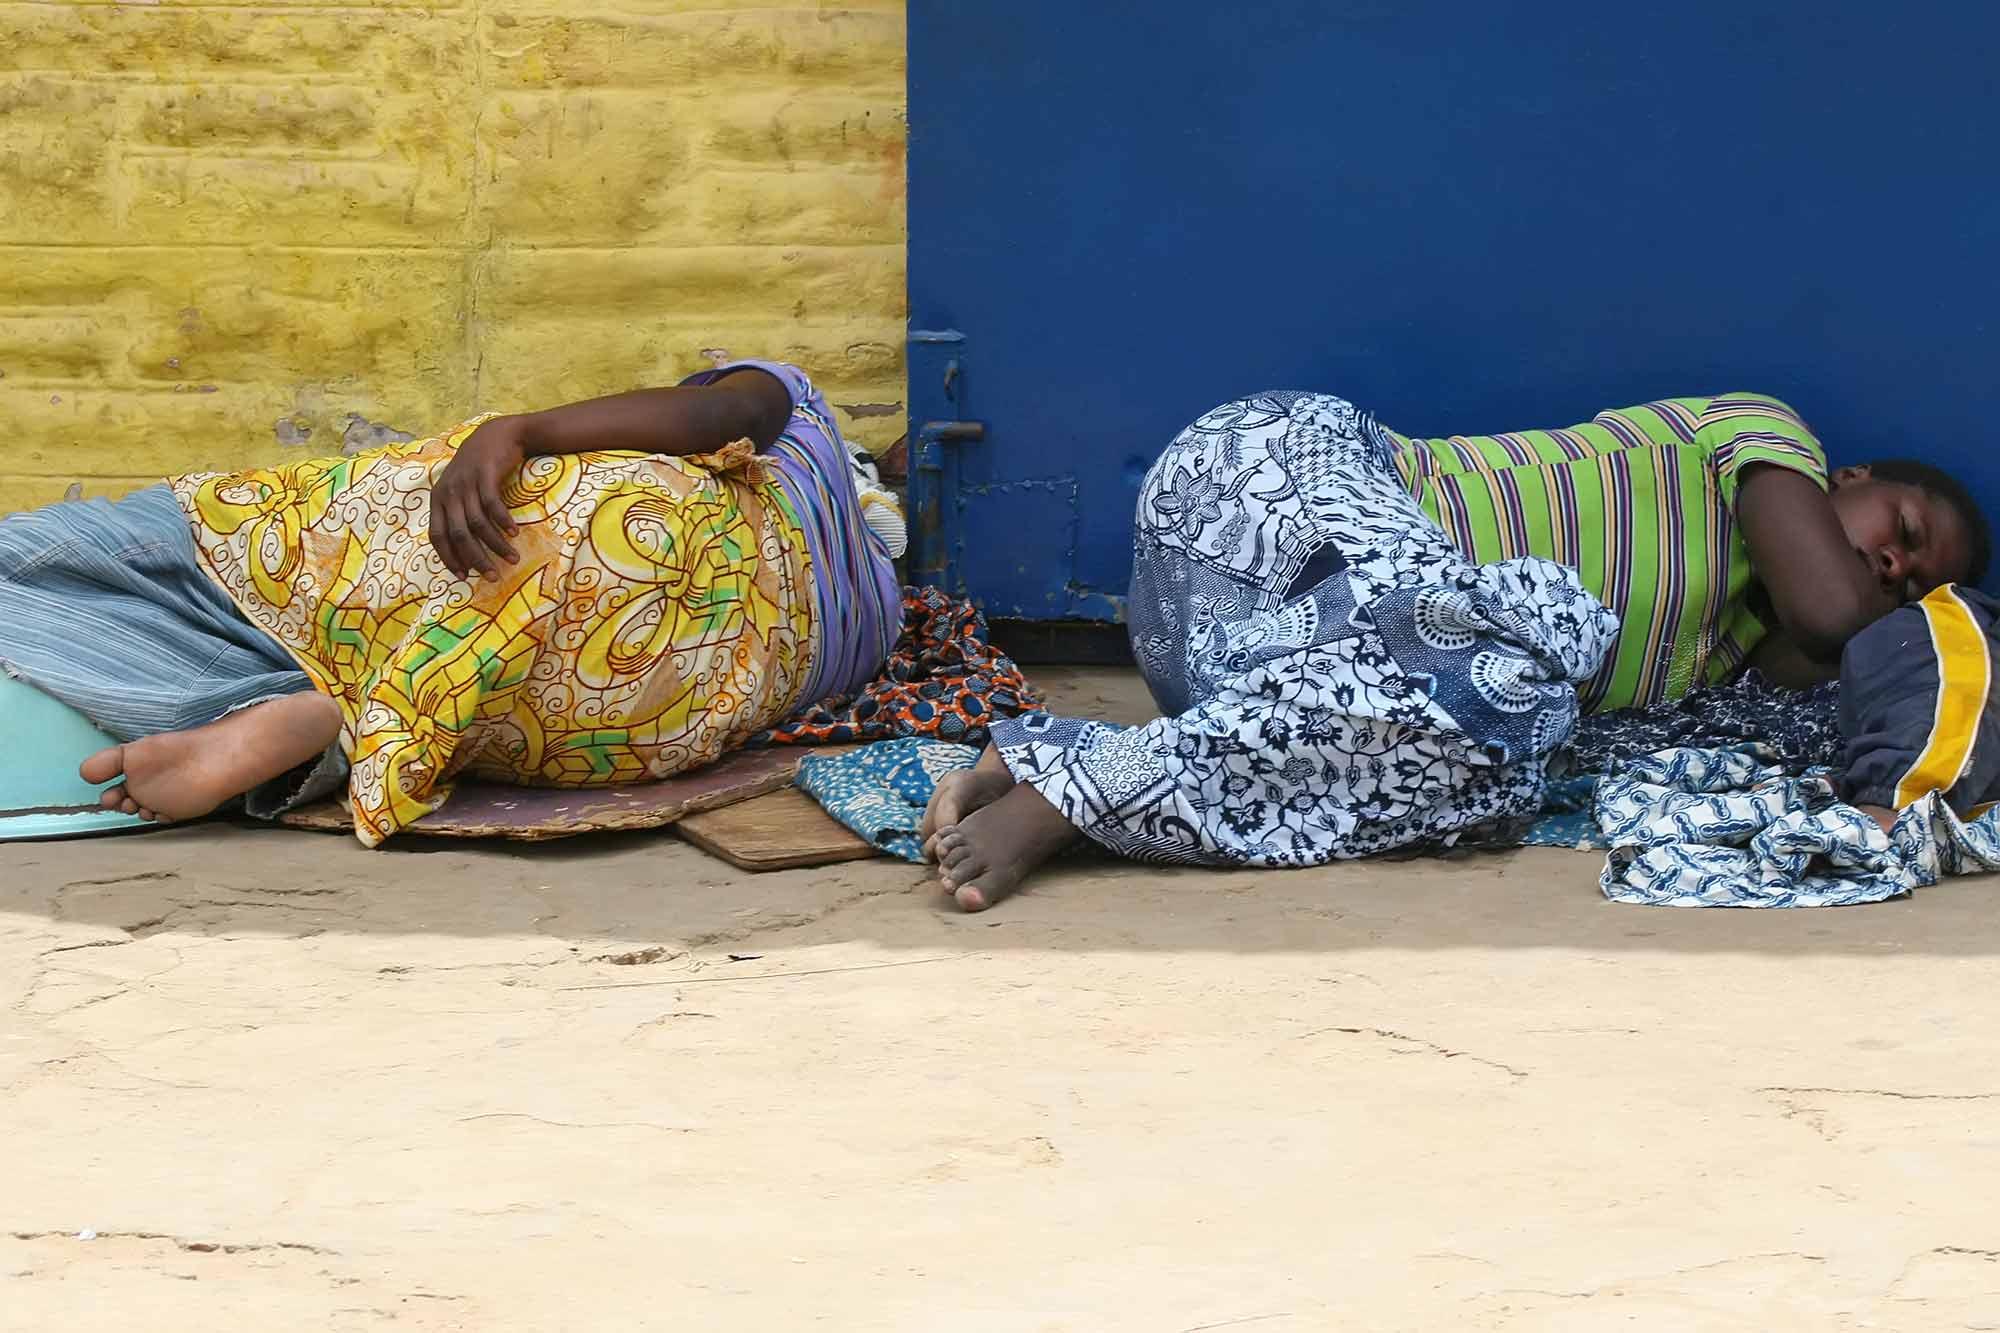 sleeping-wmen-accra-ghana-africa